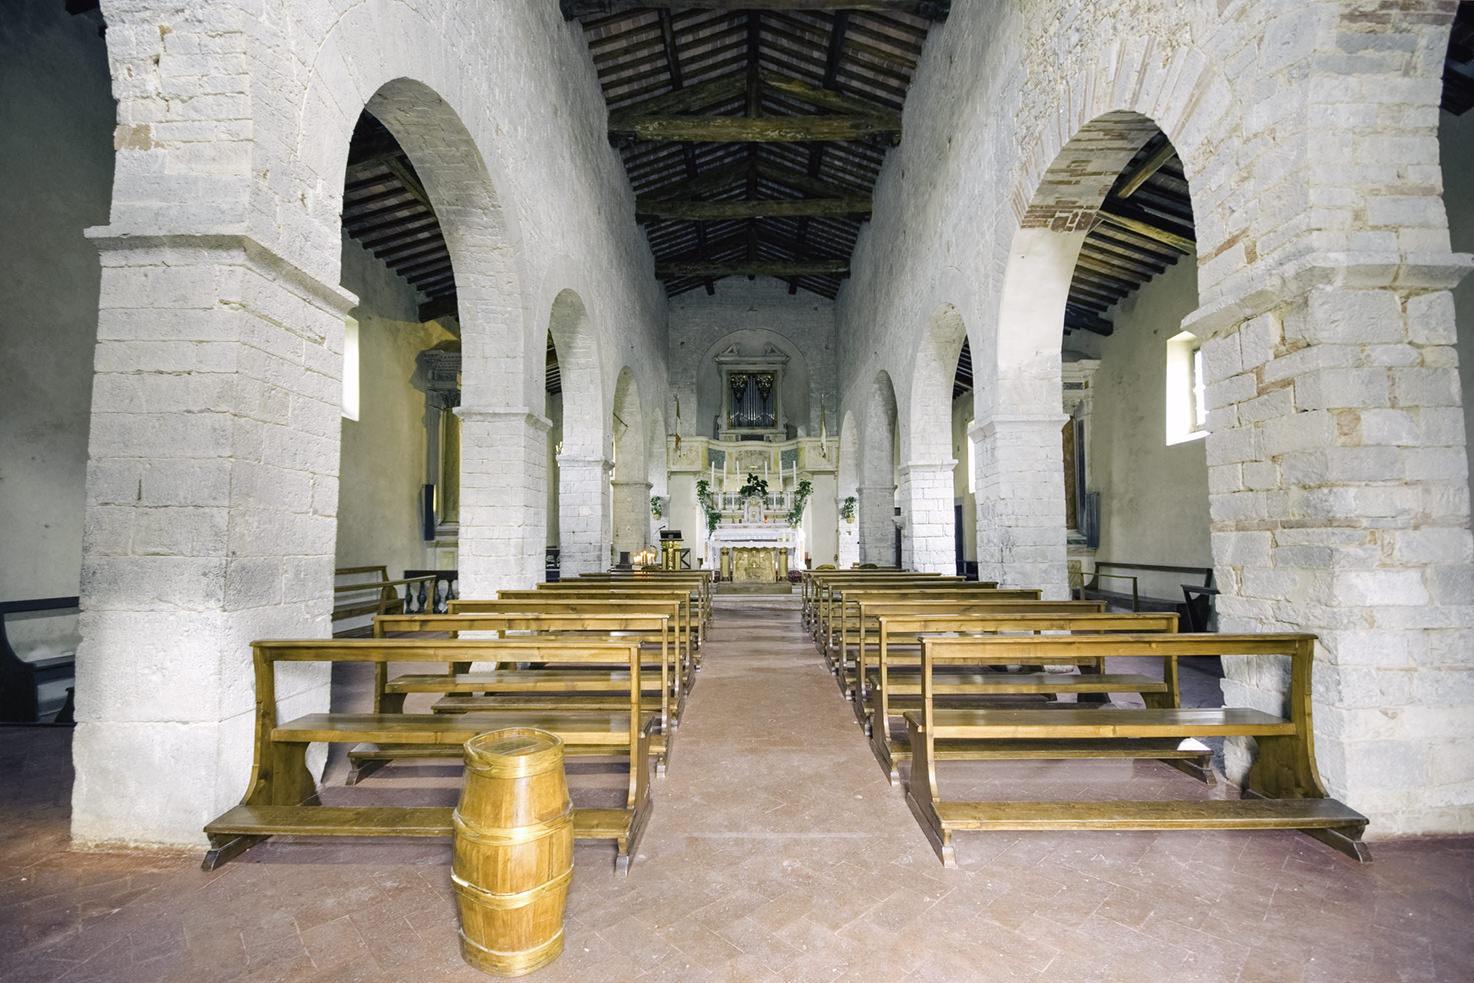 Interior of Pieve di Spaltenna